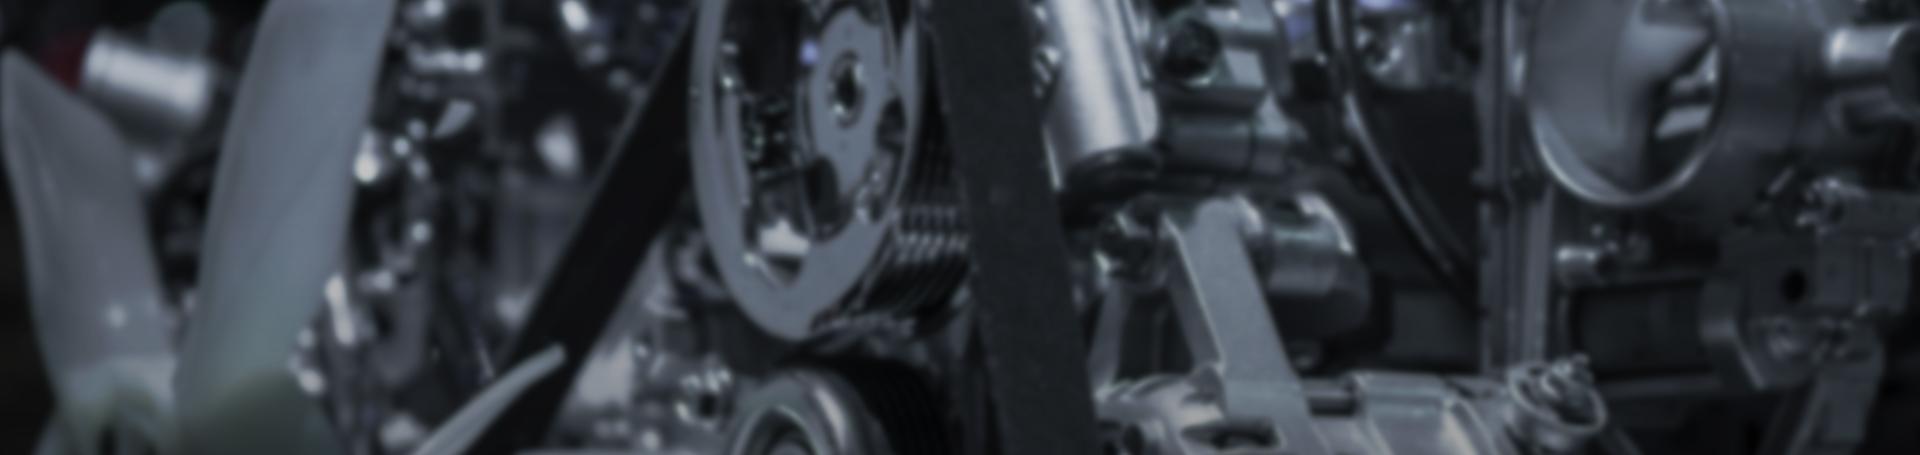 Parts For German Cars Ebay Shops Vw Bug Electric Fuel Pump